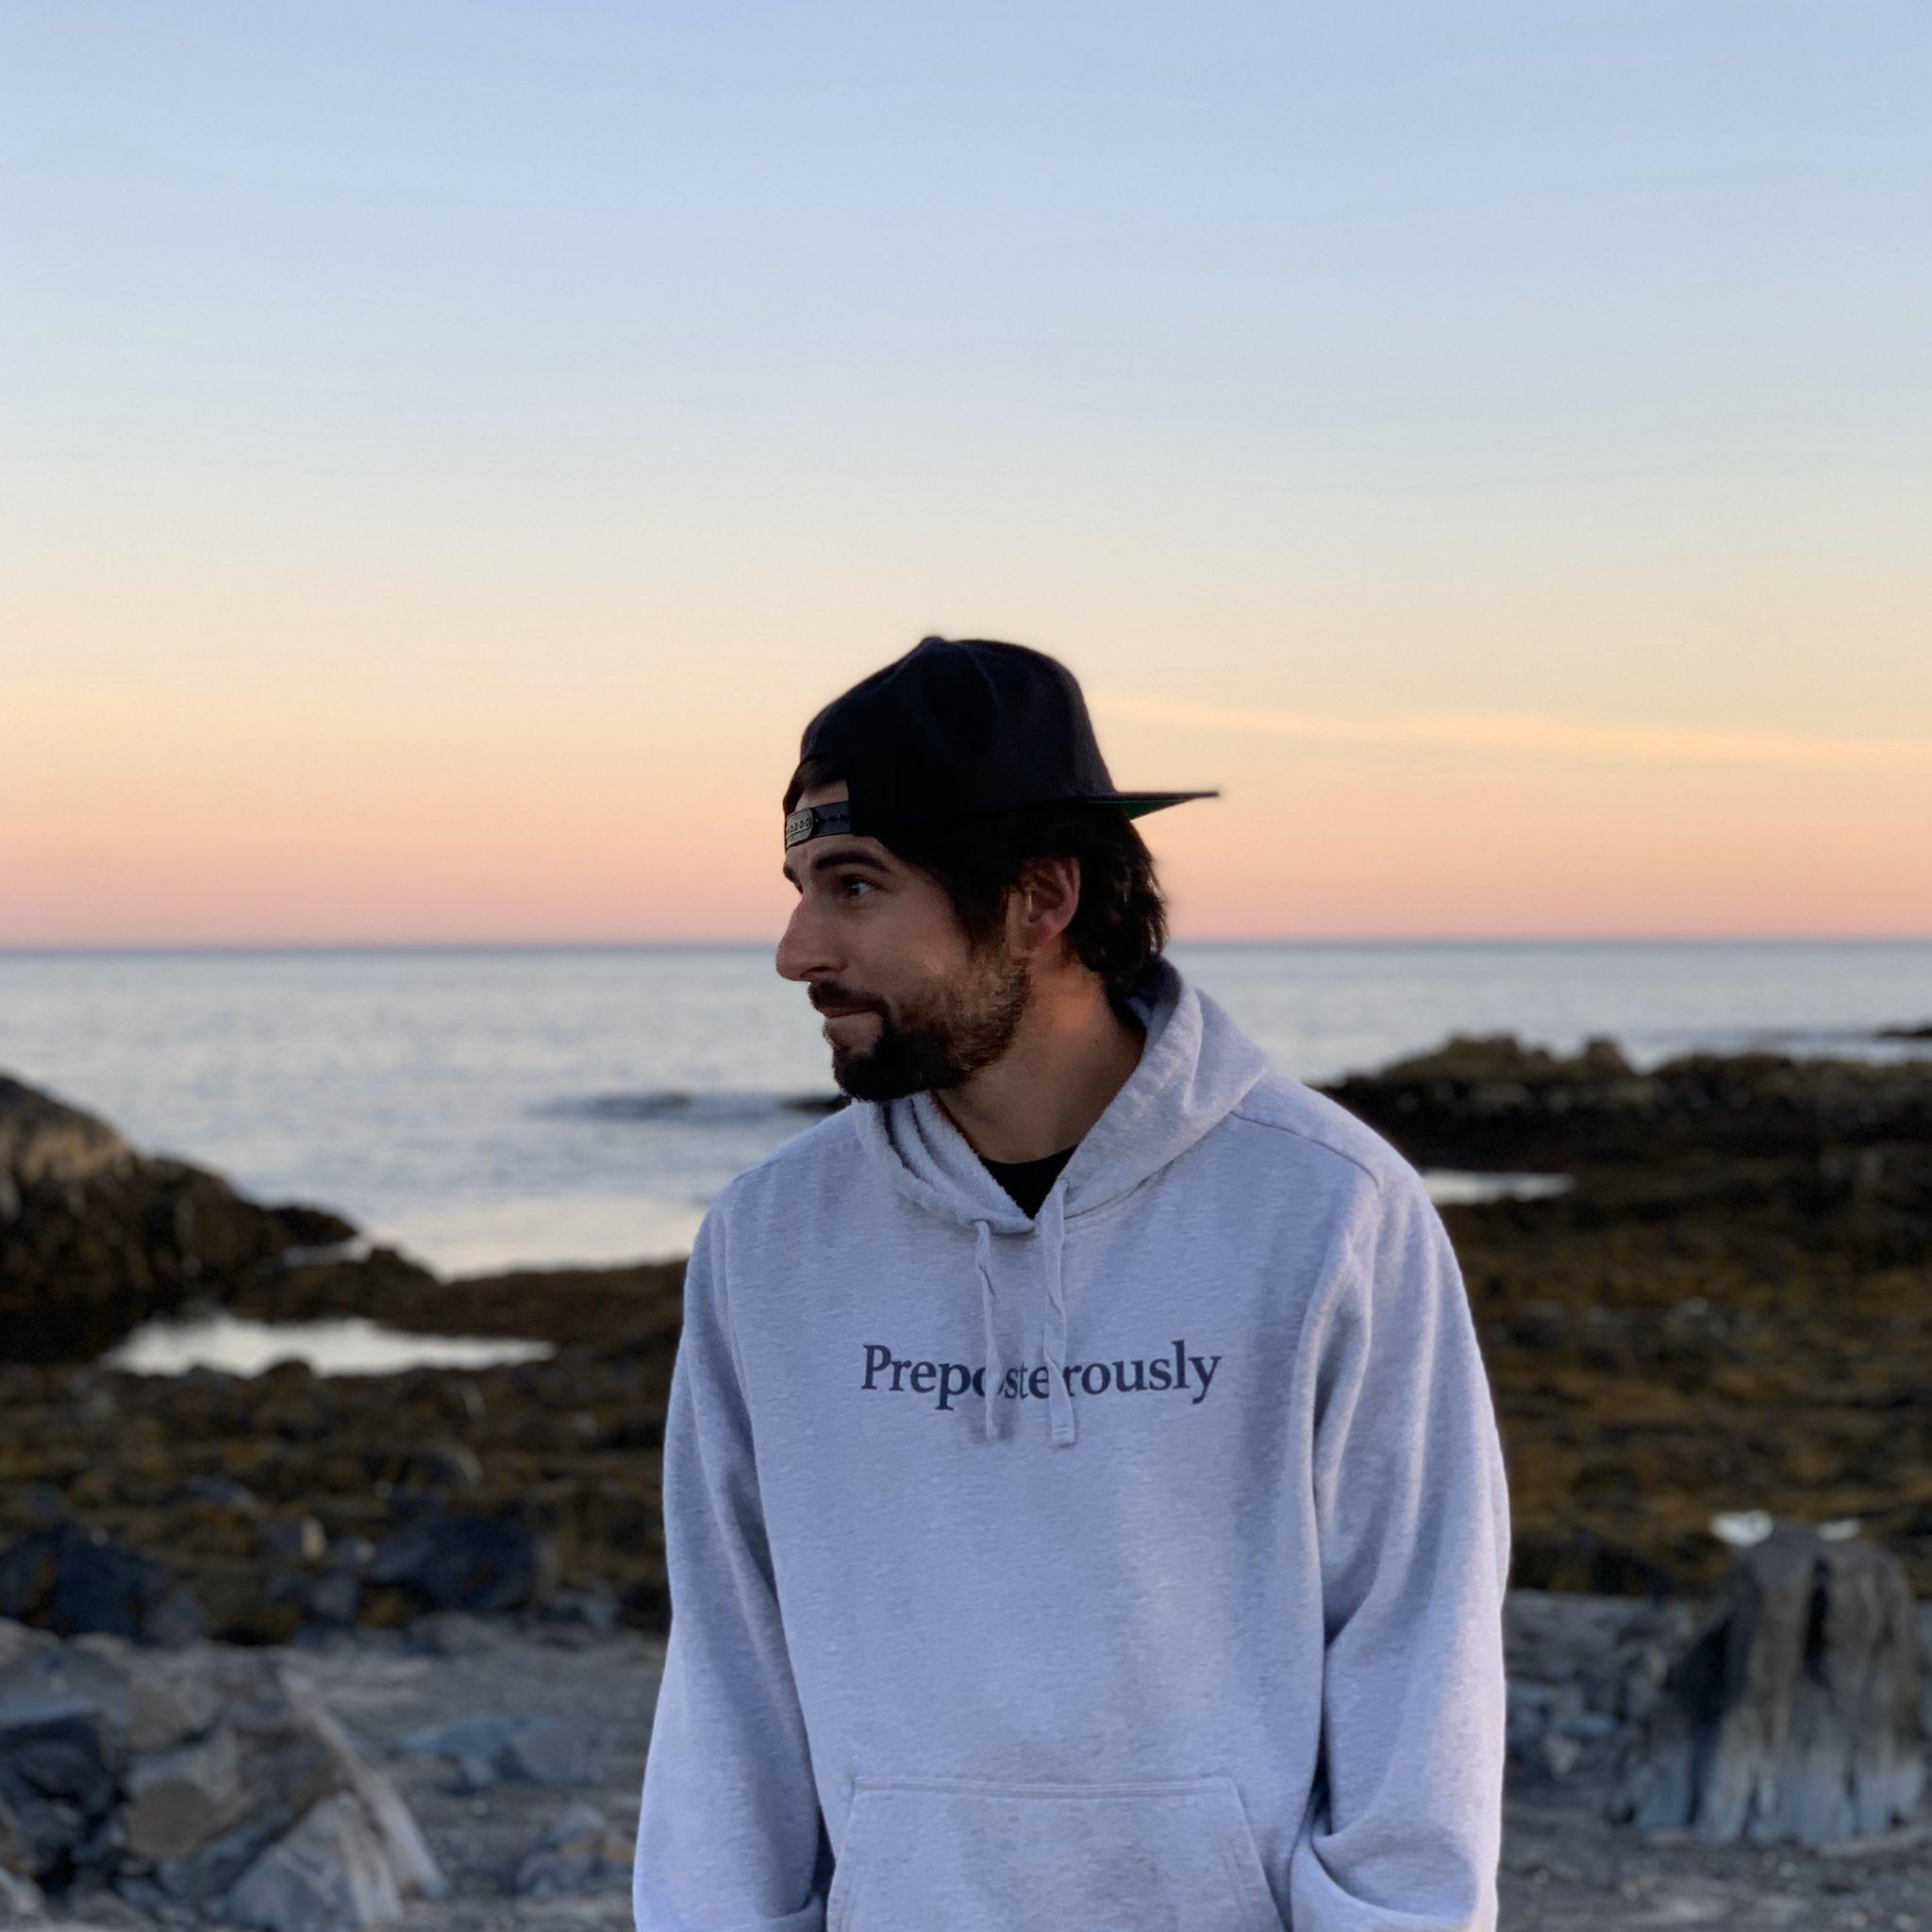 preposterously hoodie spose – Teeno1us